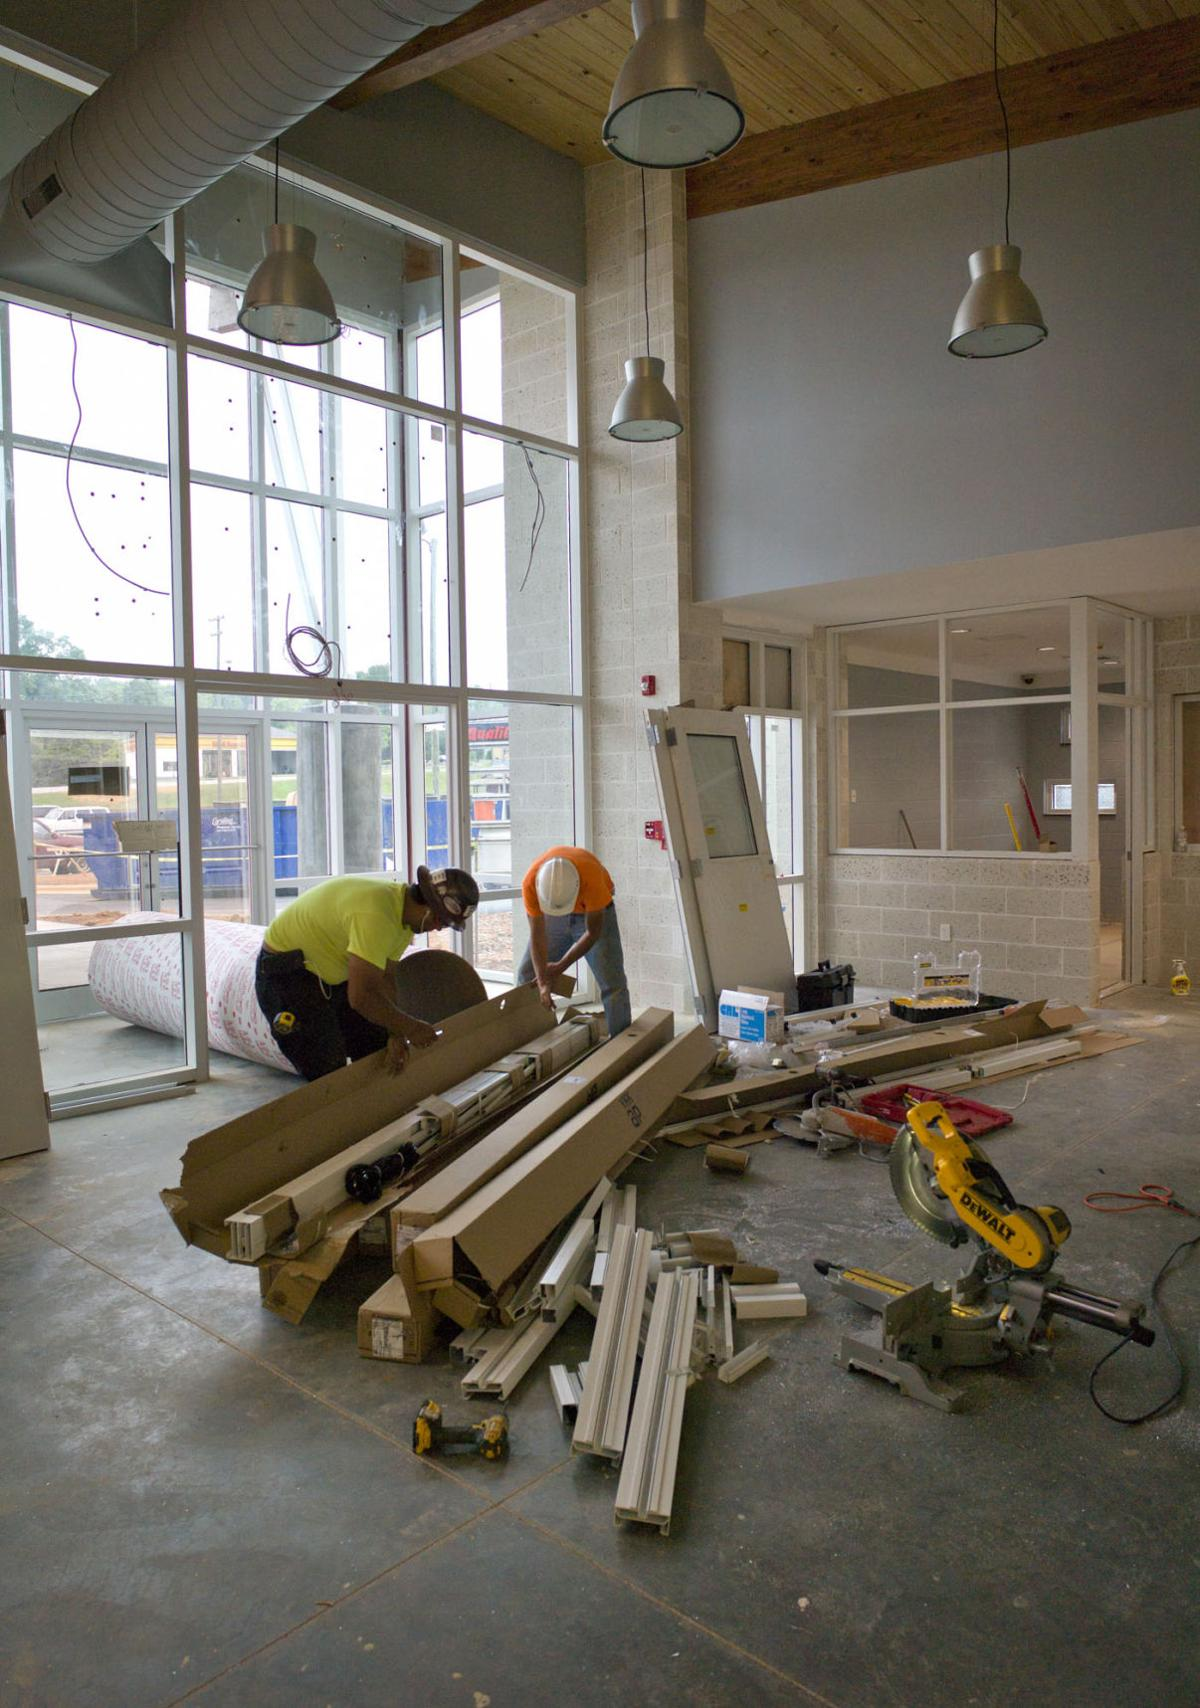 Rolfe House Foyer : New home for forsyth humane shelter under construction